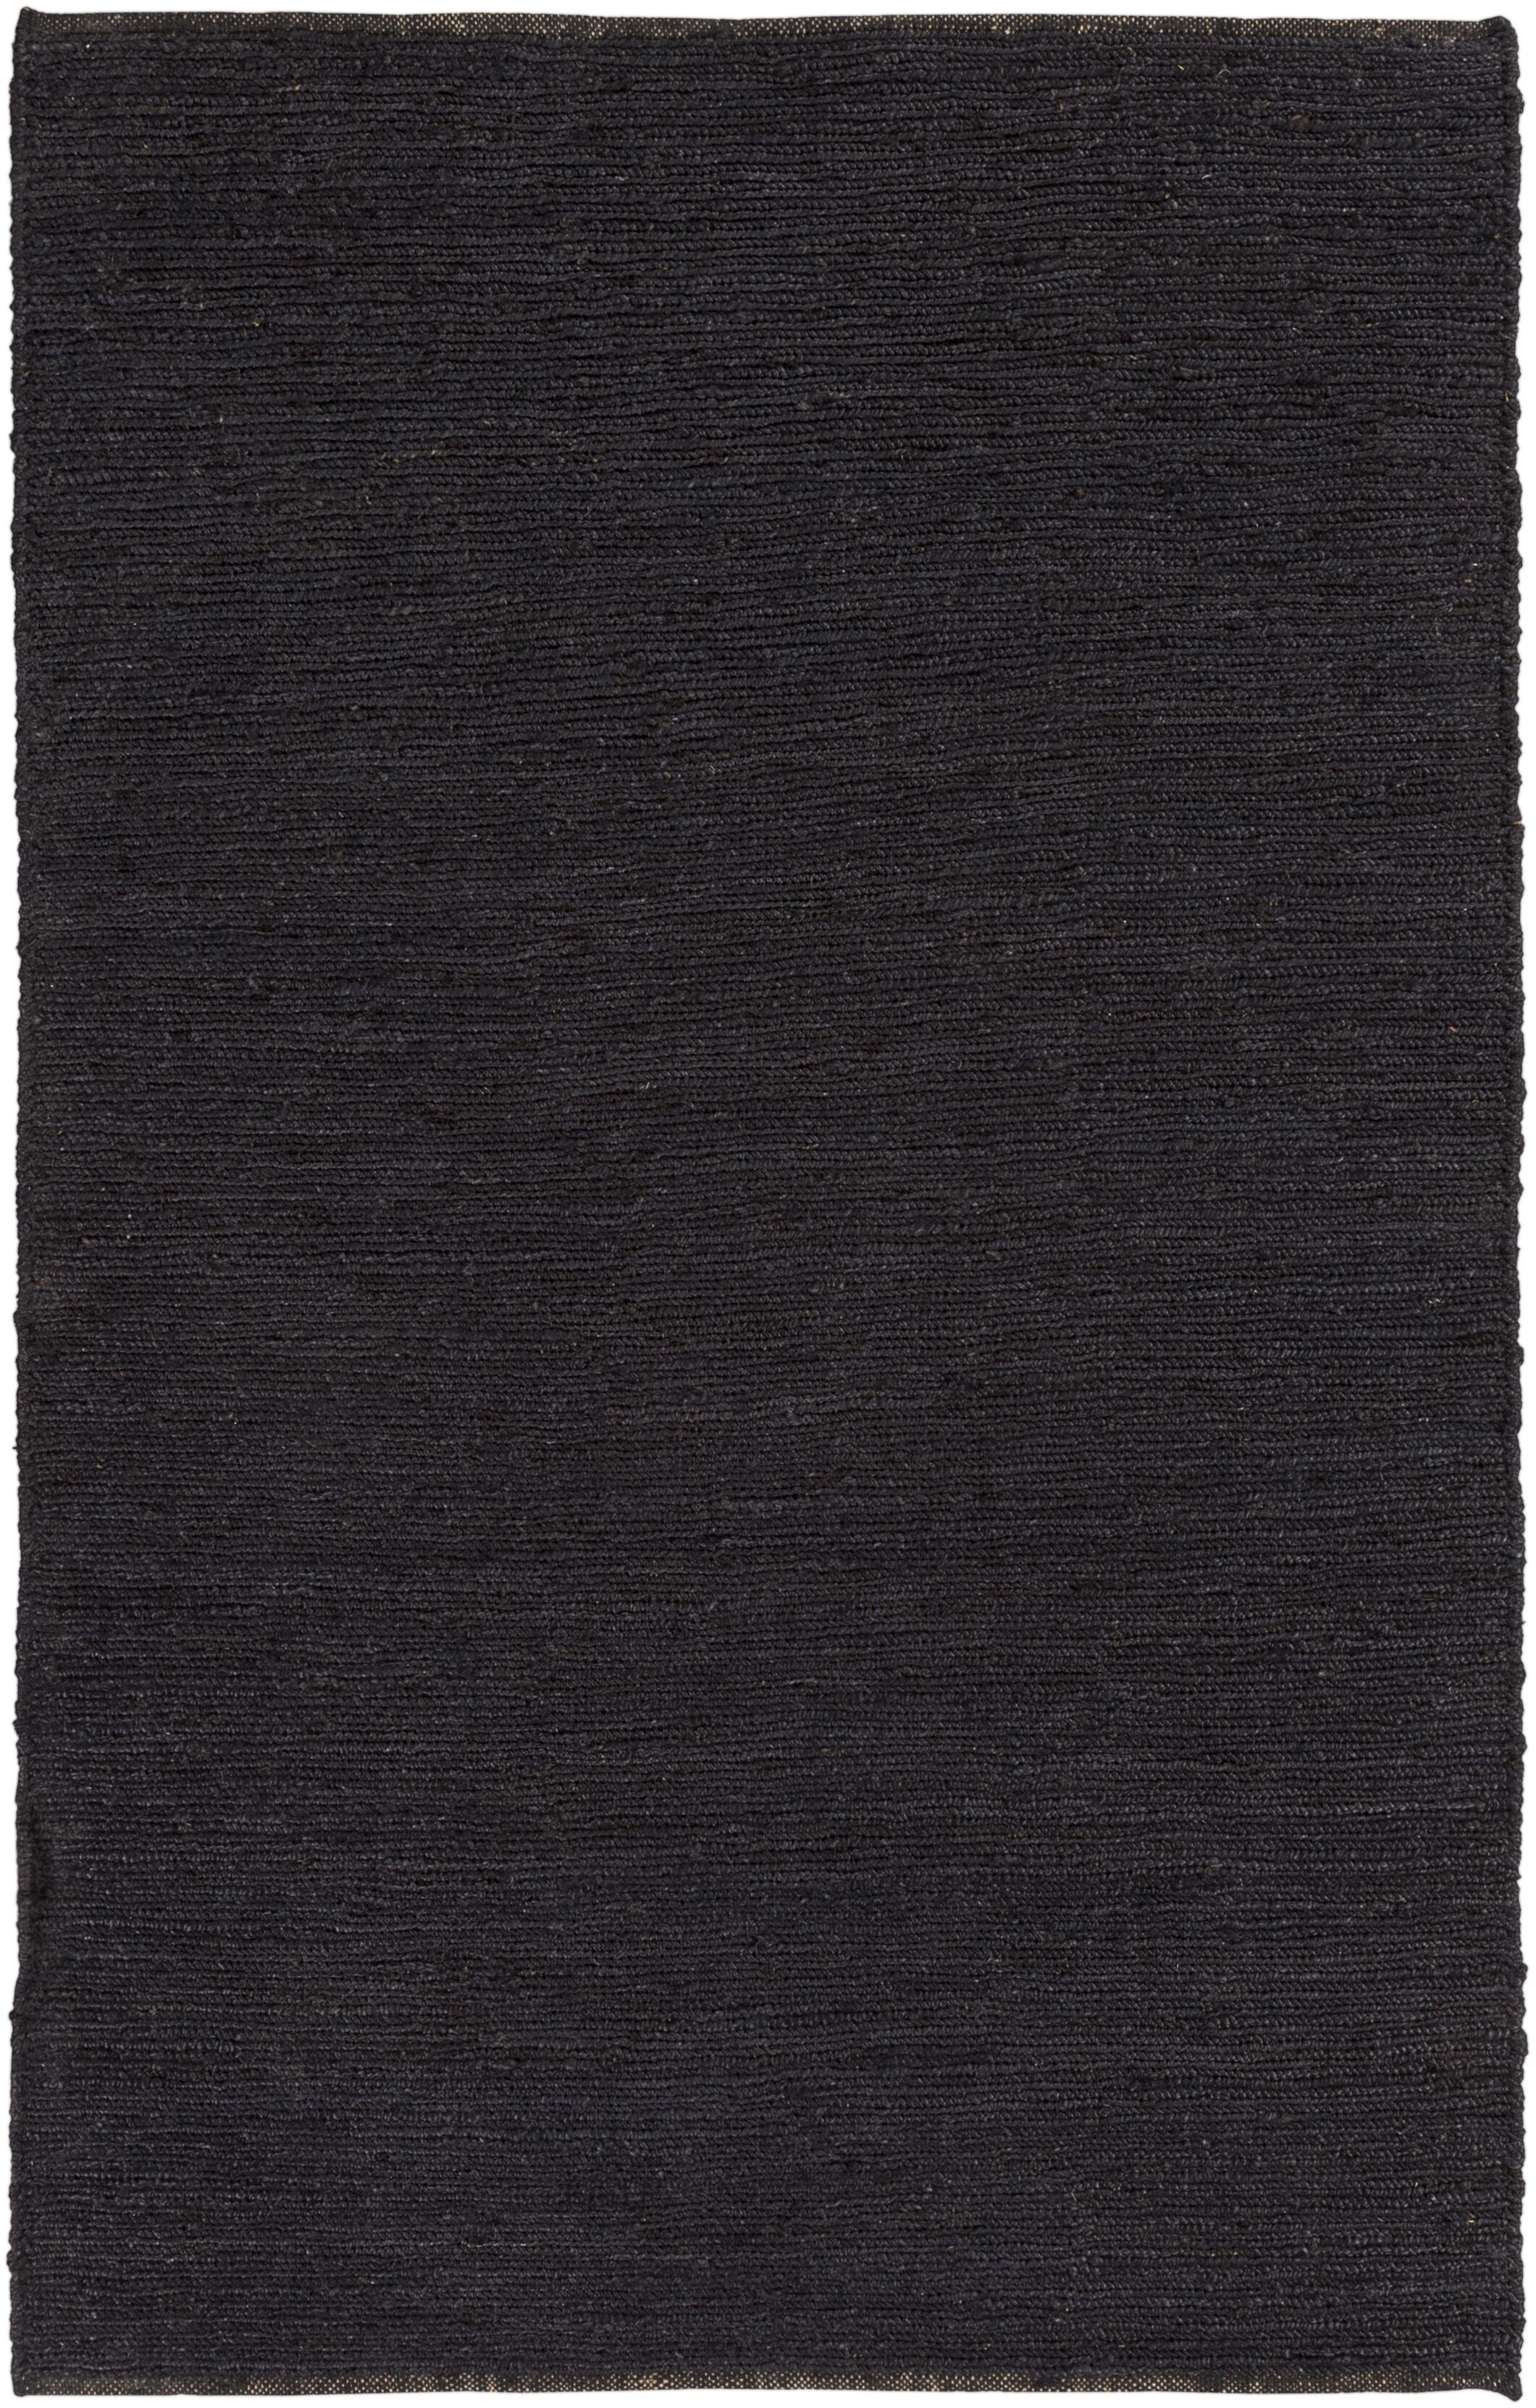 Zellers Hand-Woven Black Area Rug Rug Size: Rectangle 8' x 10'